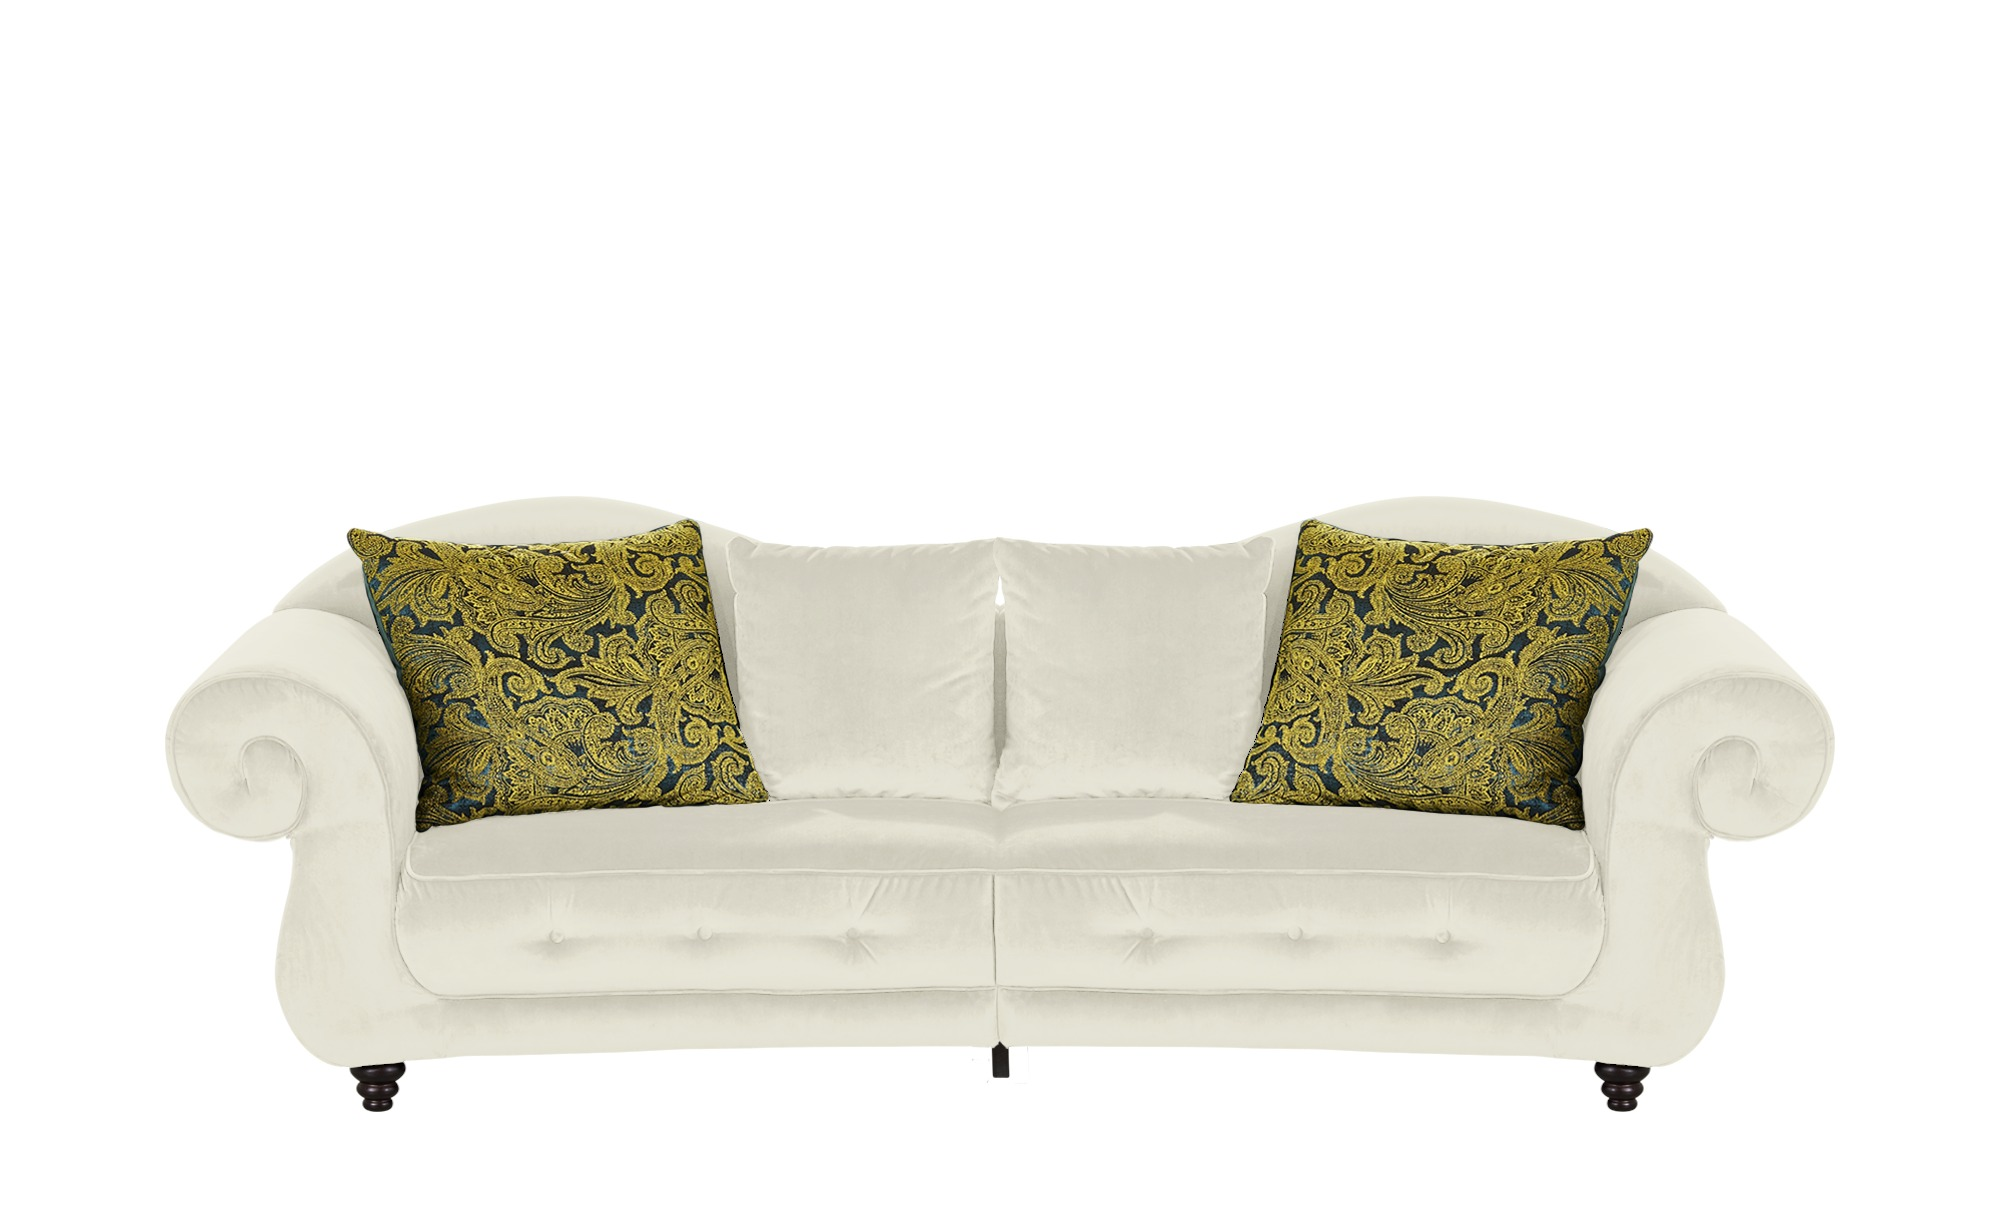 Design Big Sofa creme - Mikrofaser Nobody ¦ creme ¦ Maße (cm): B: 288 H: 98 T: 110 Polstermöbel > Sofas > Big-Sofas - Höffner